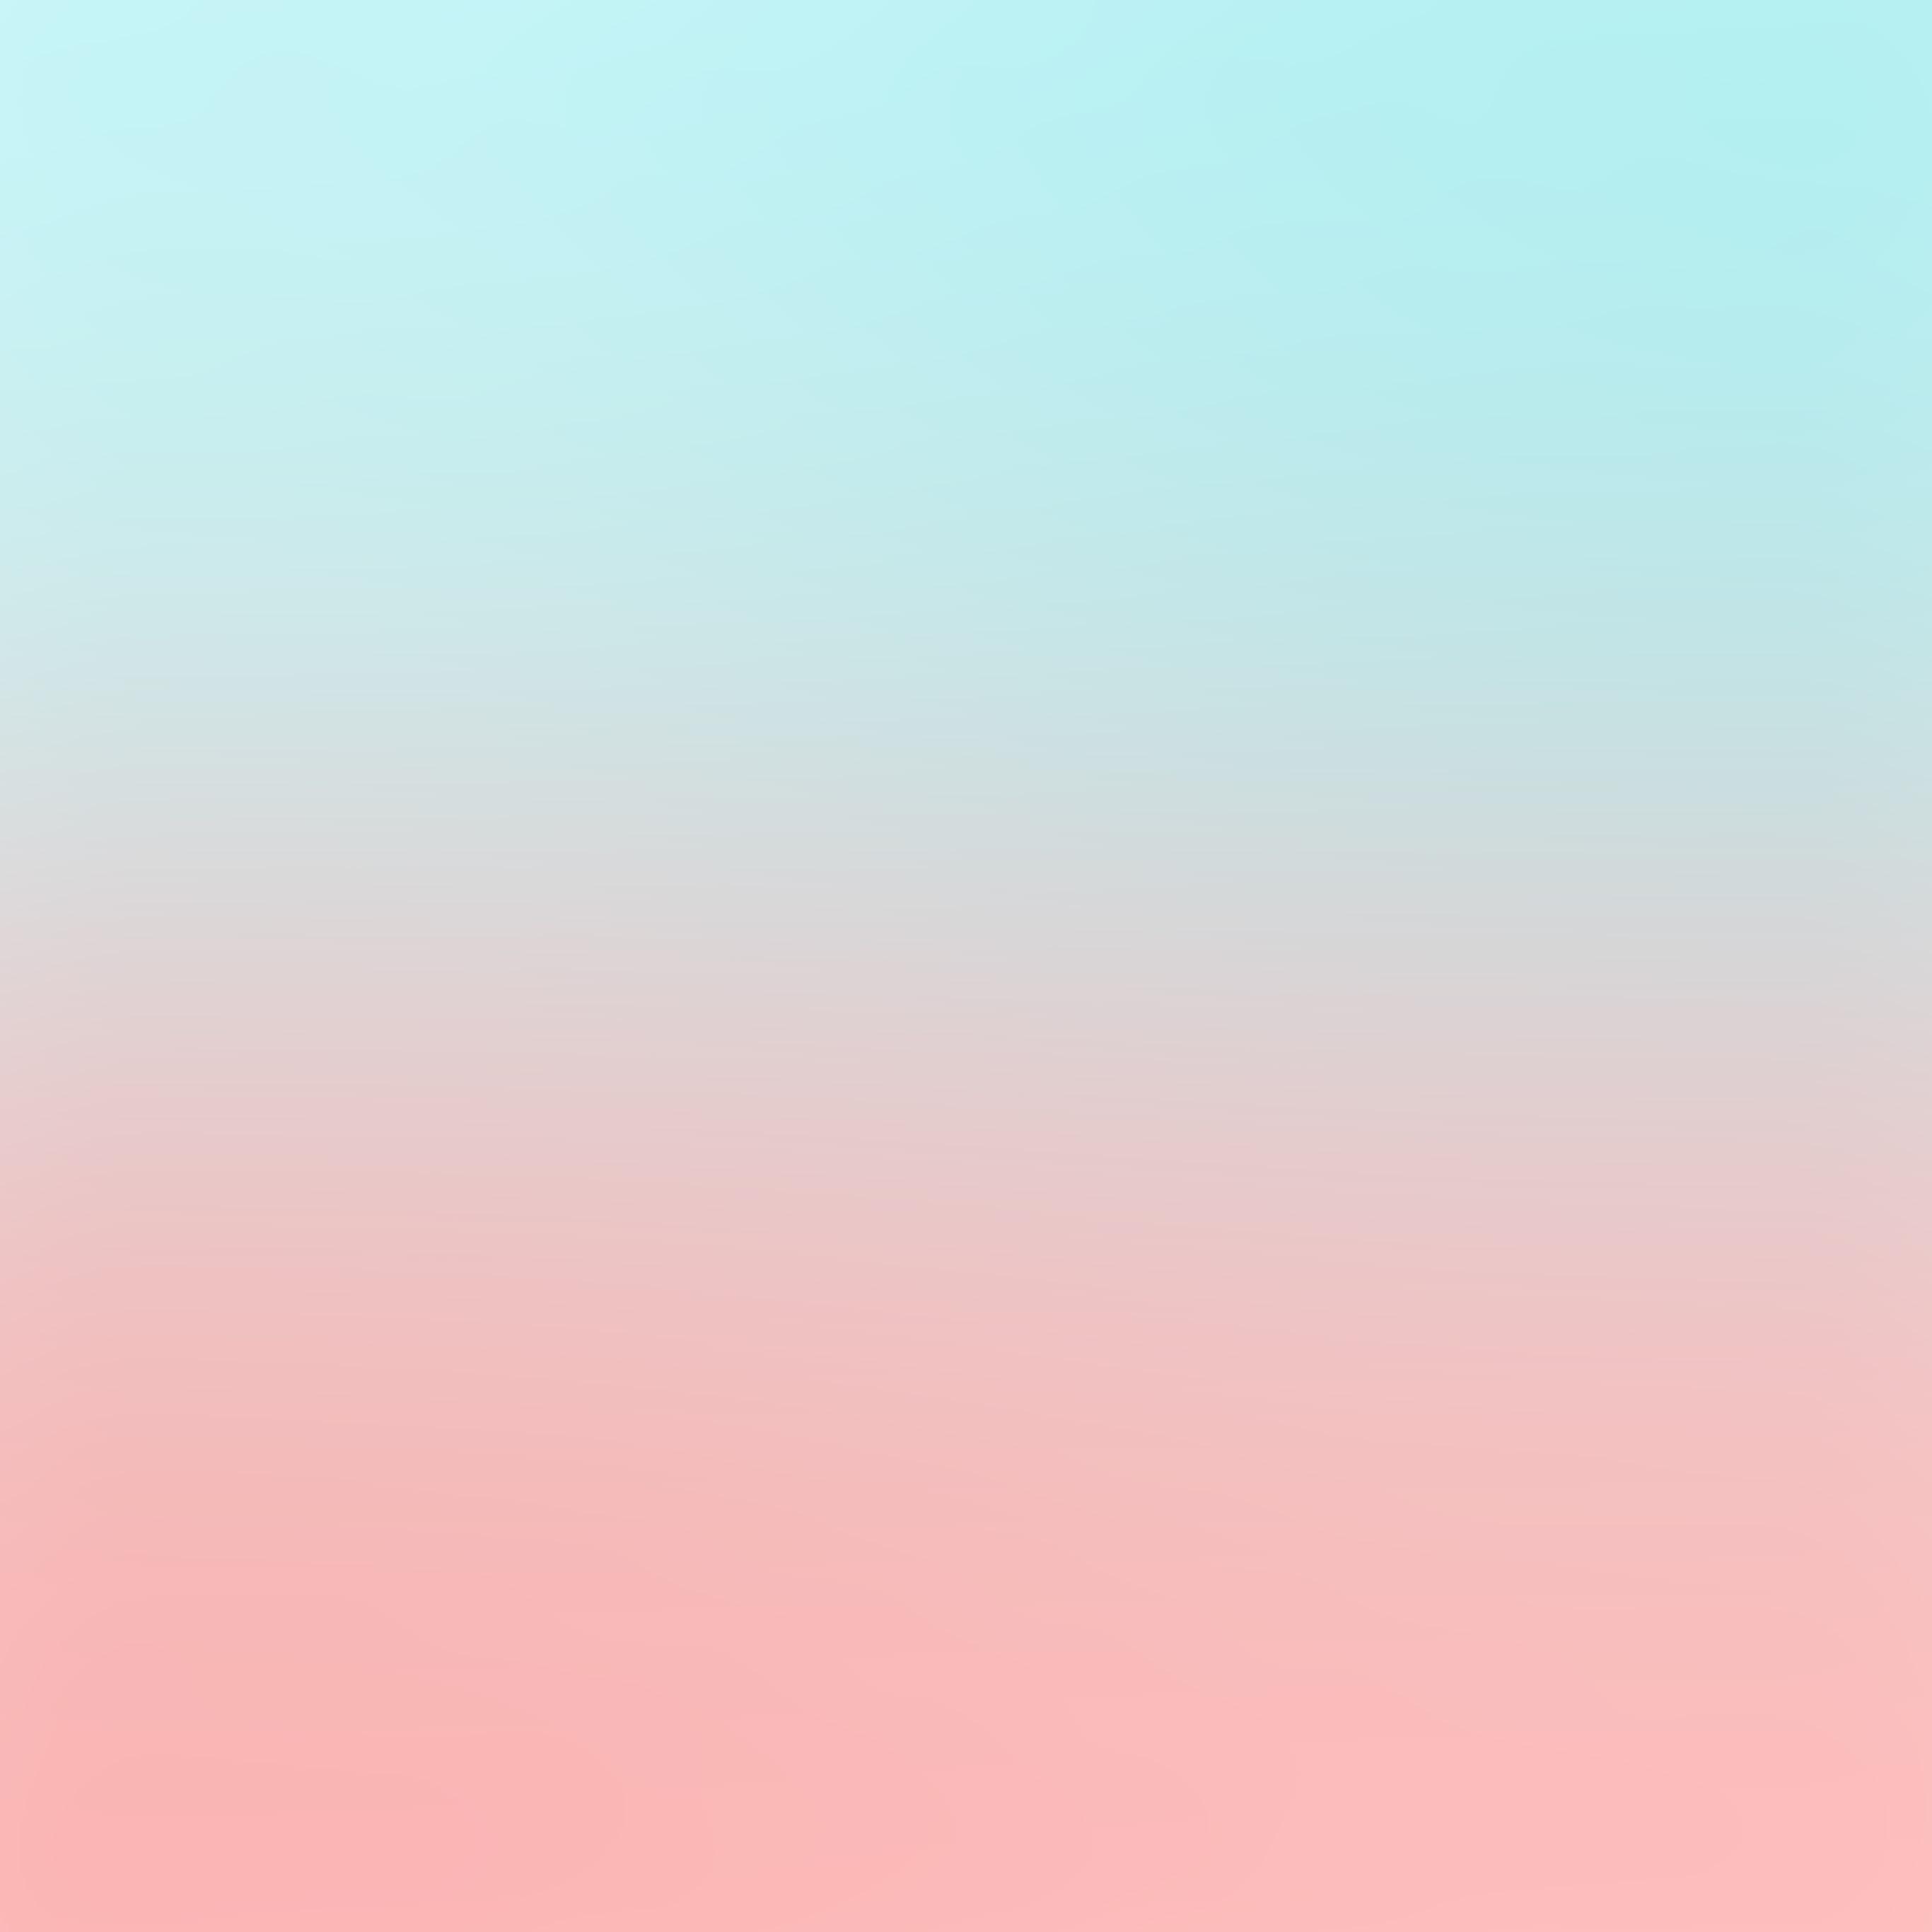 Wallpaper Hd Nexus Sm40 Blue Red Soft Pastel Blur Gradation Wallpaper